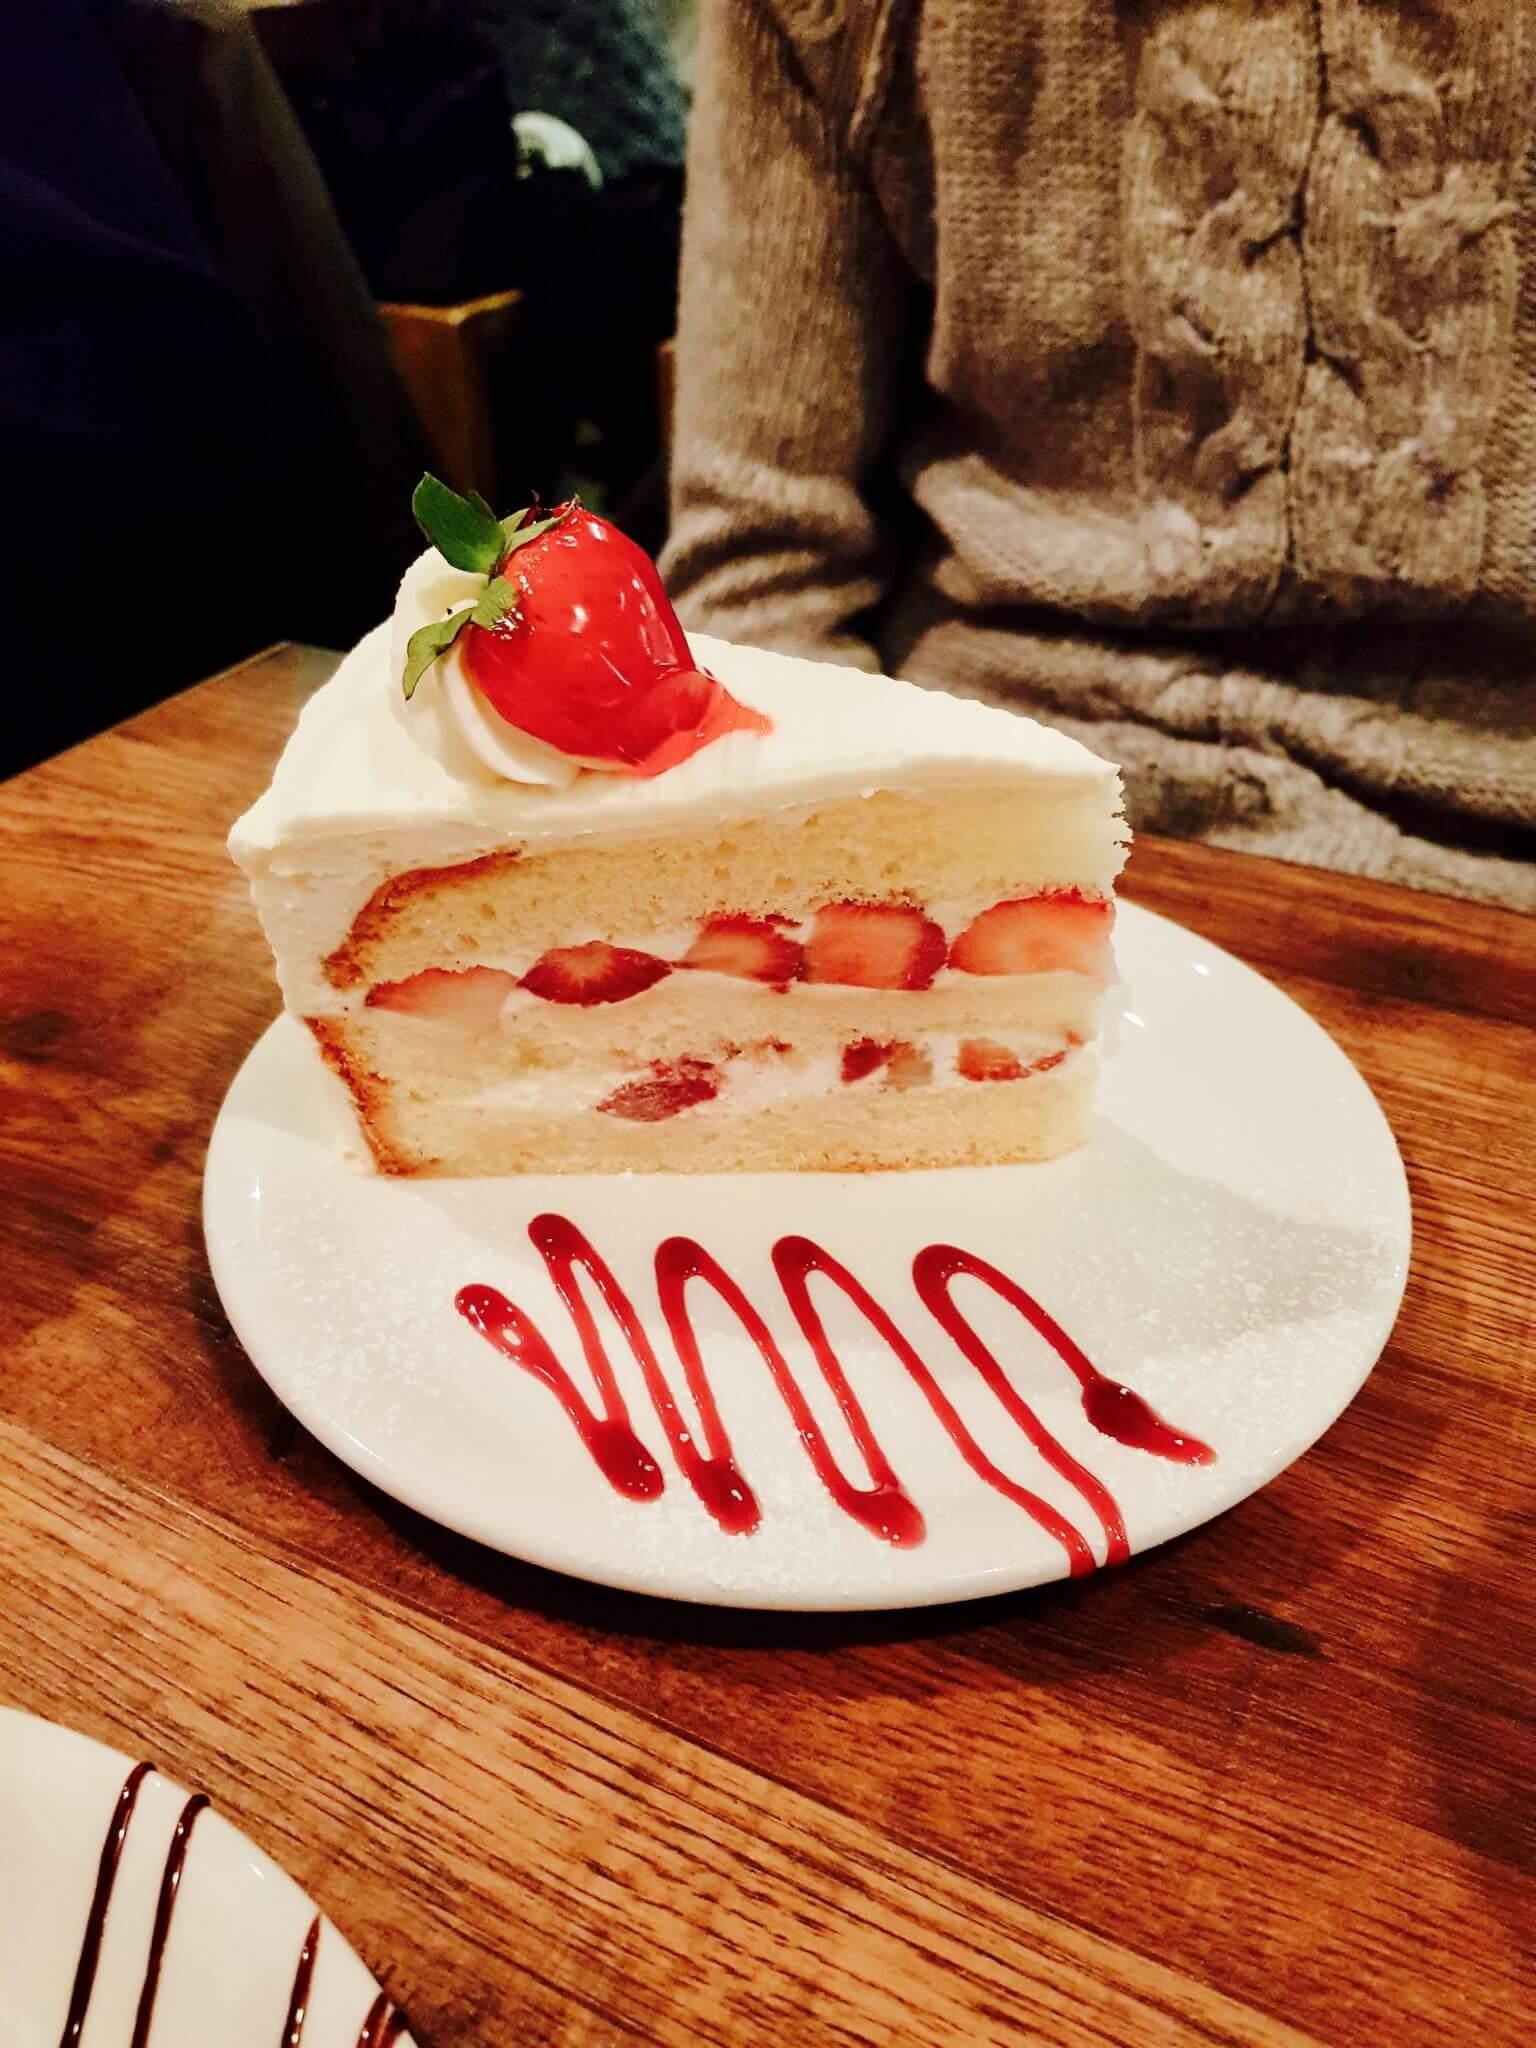 Où manger un cheesecake à New-York ?